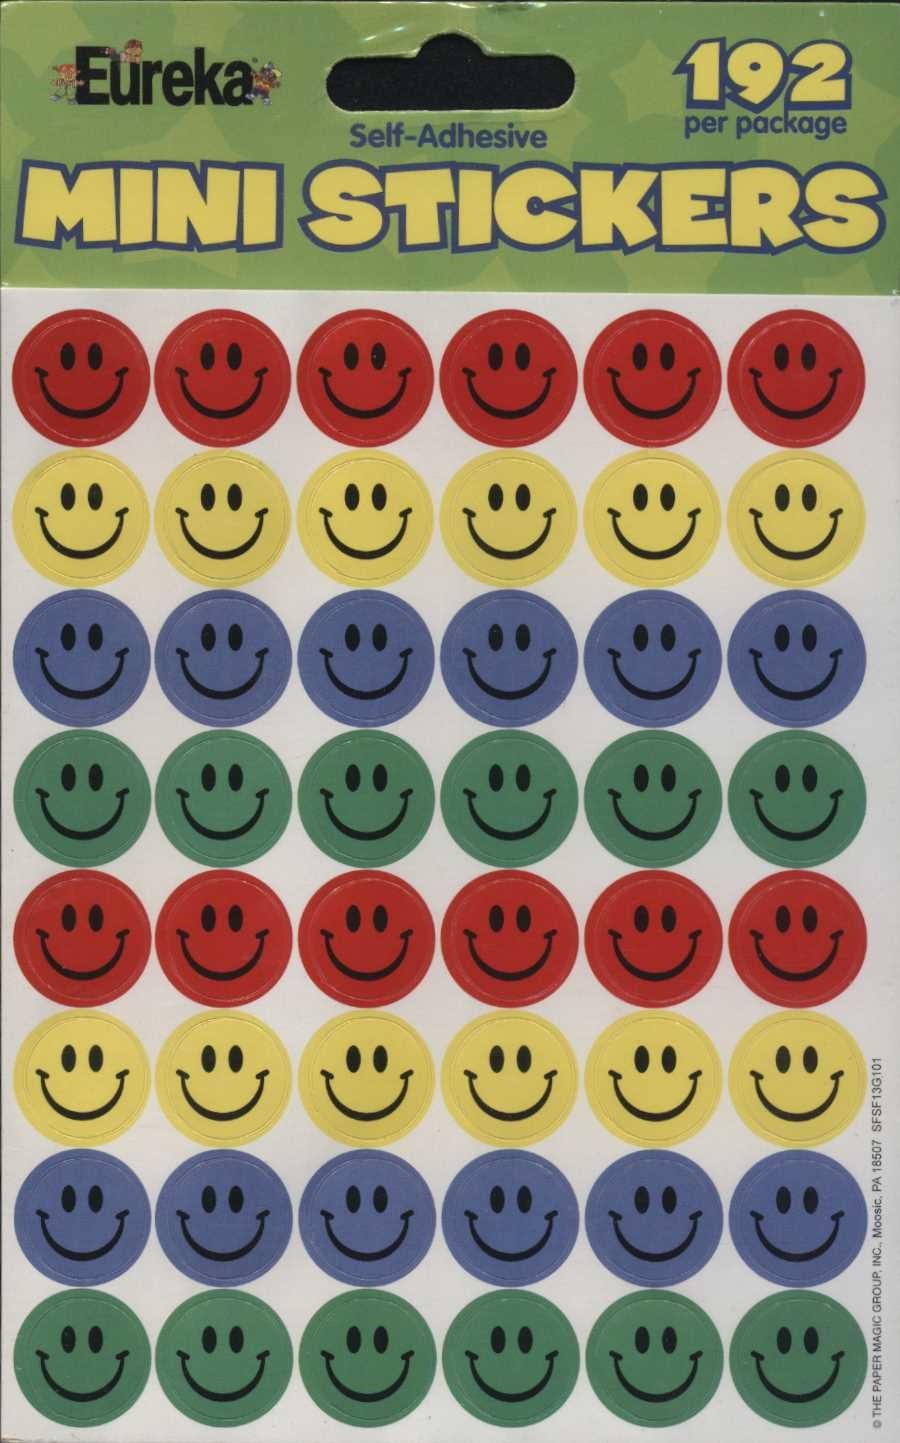 Mini Smiley Faces Stickers 192